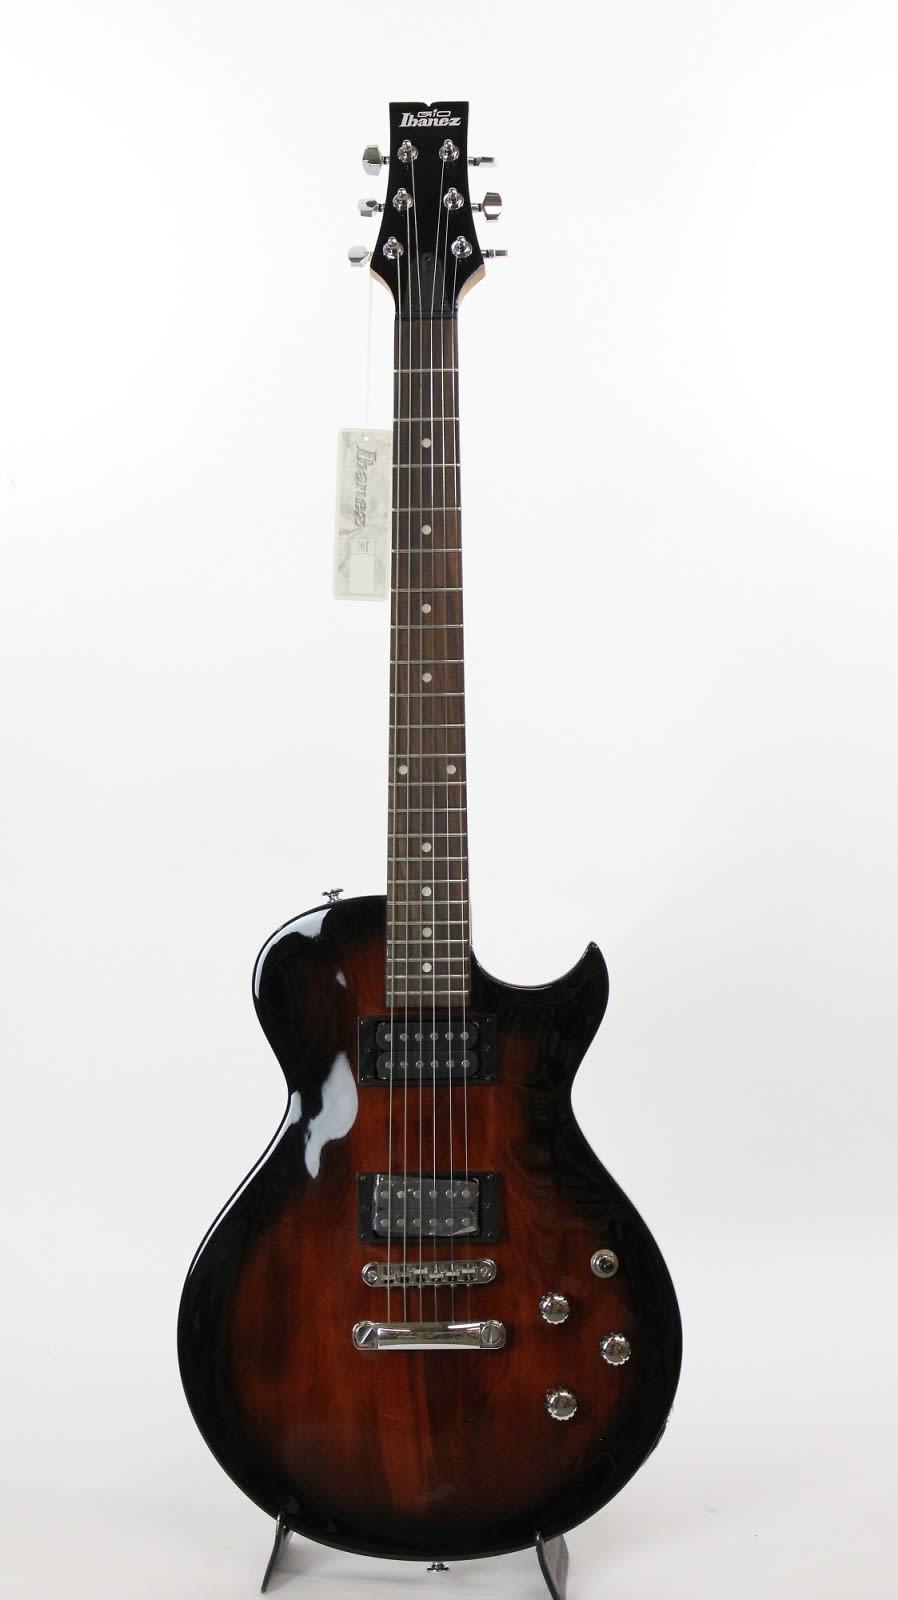 Ibanez Gio Gart60 Walnut Sunburst Wns Electric Guitar Reverb